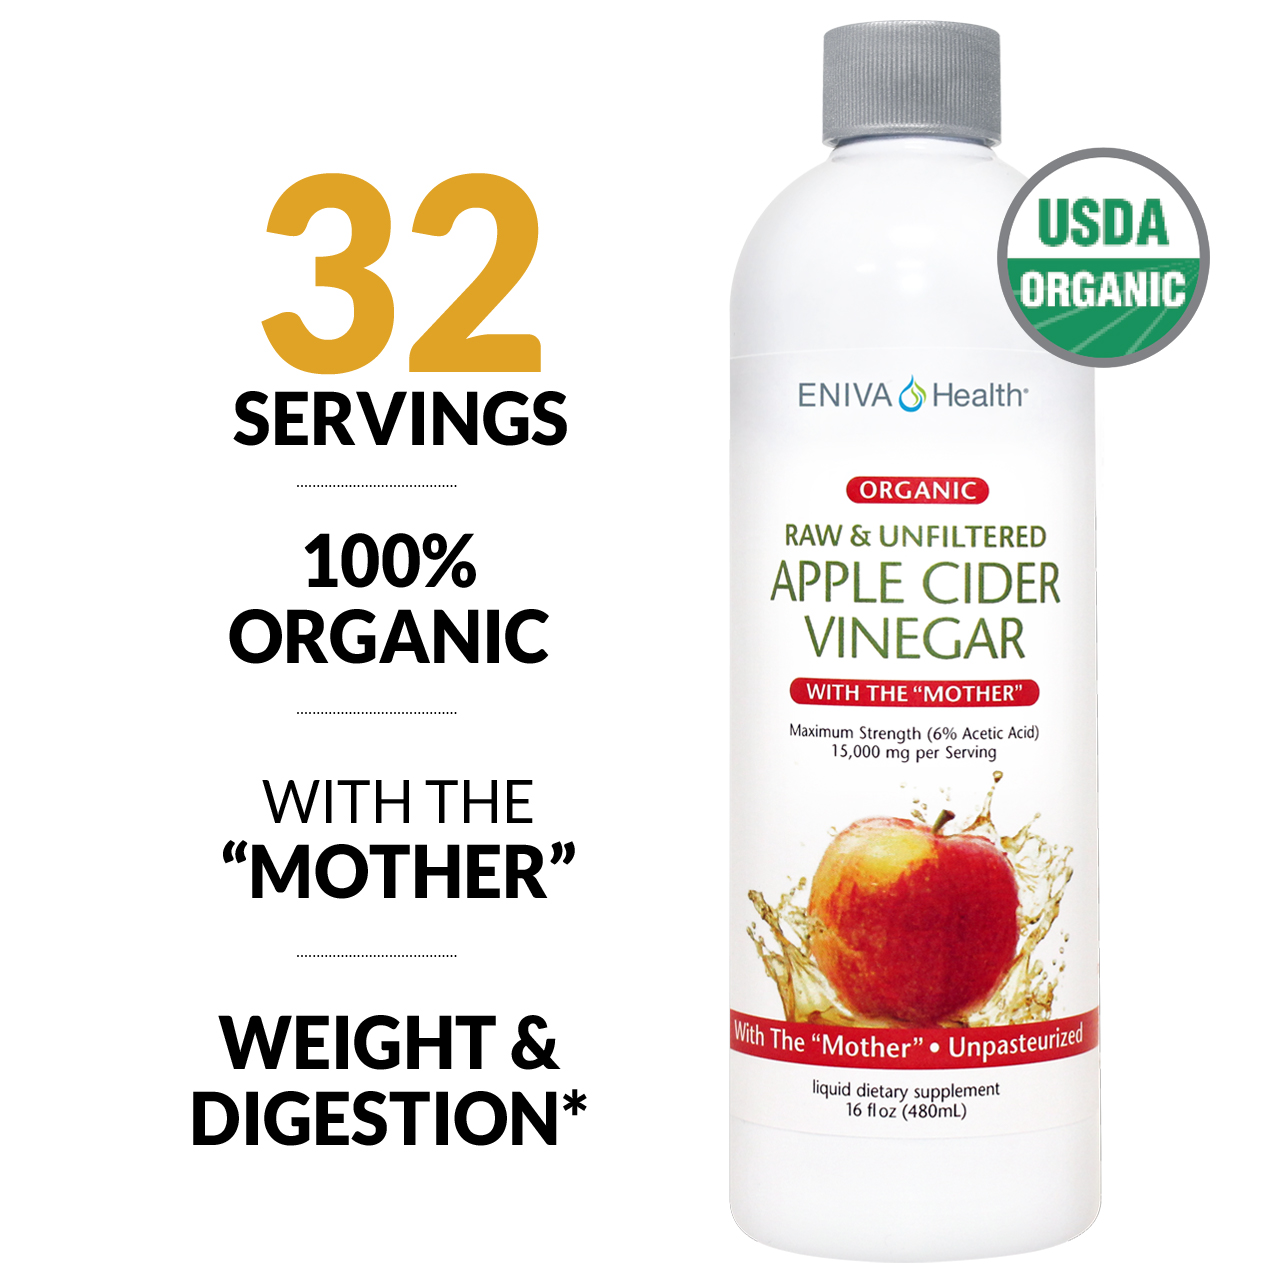 apple-cider-vinegar-mini-usda-organic-1.jpg